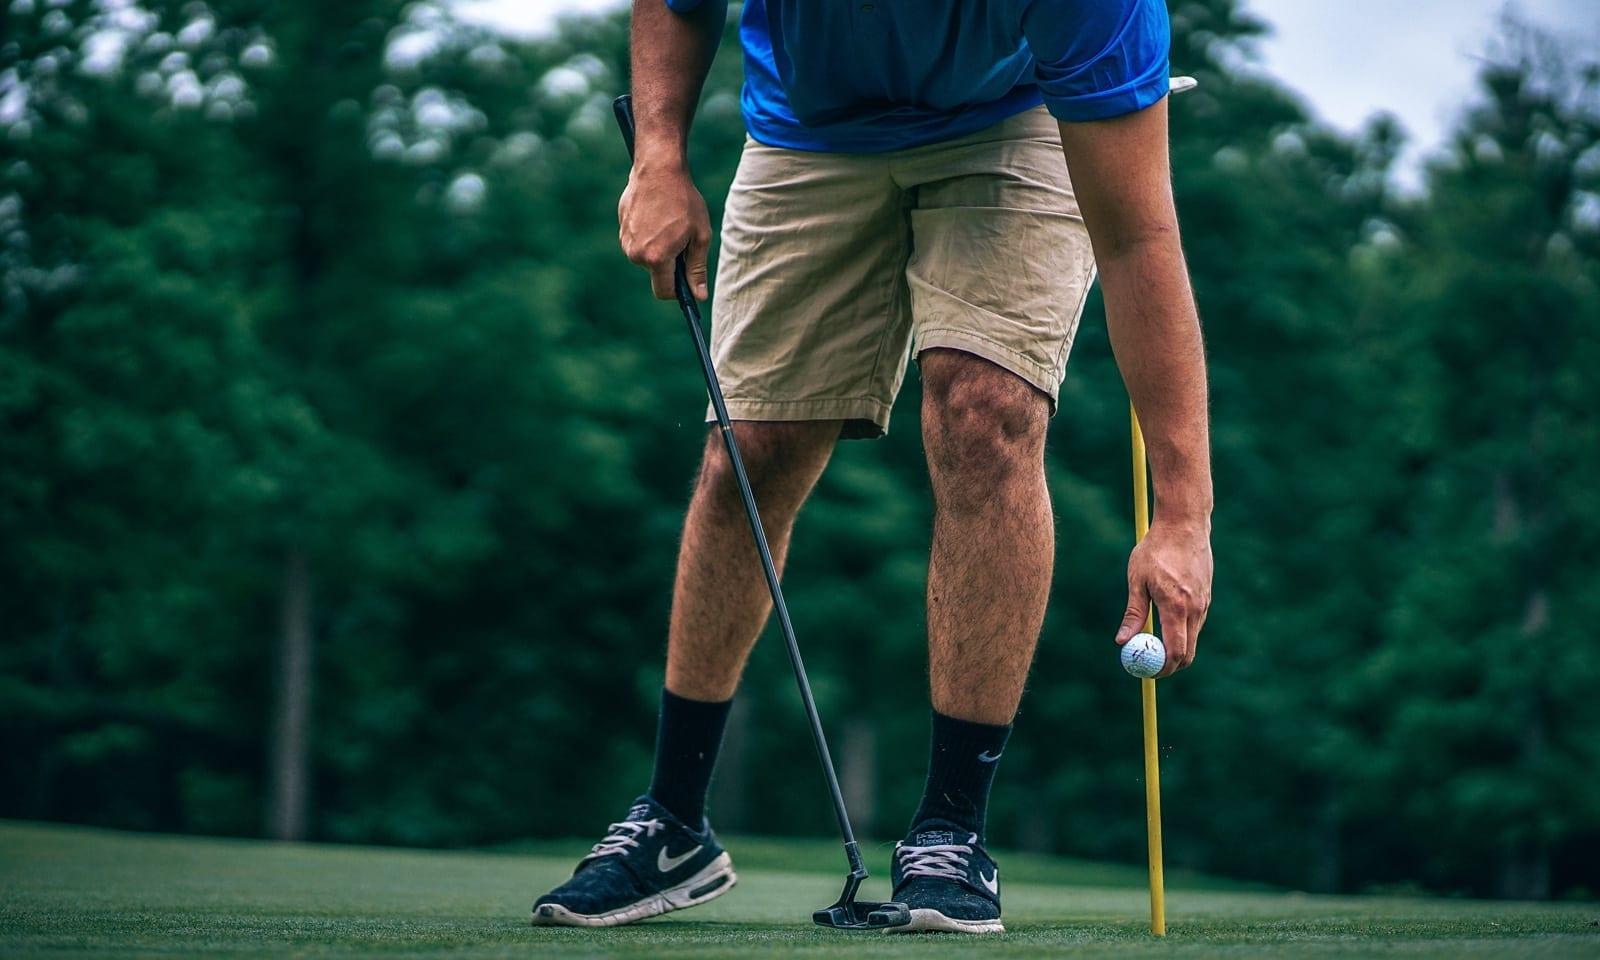 golf-shoe-image-1